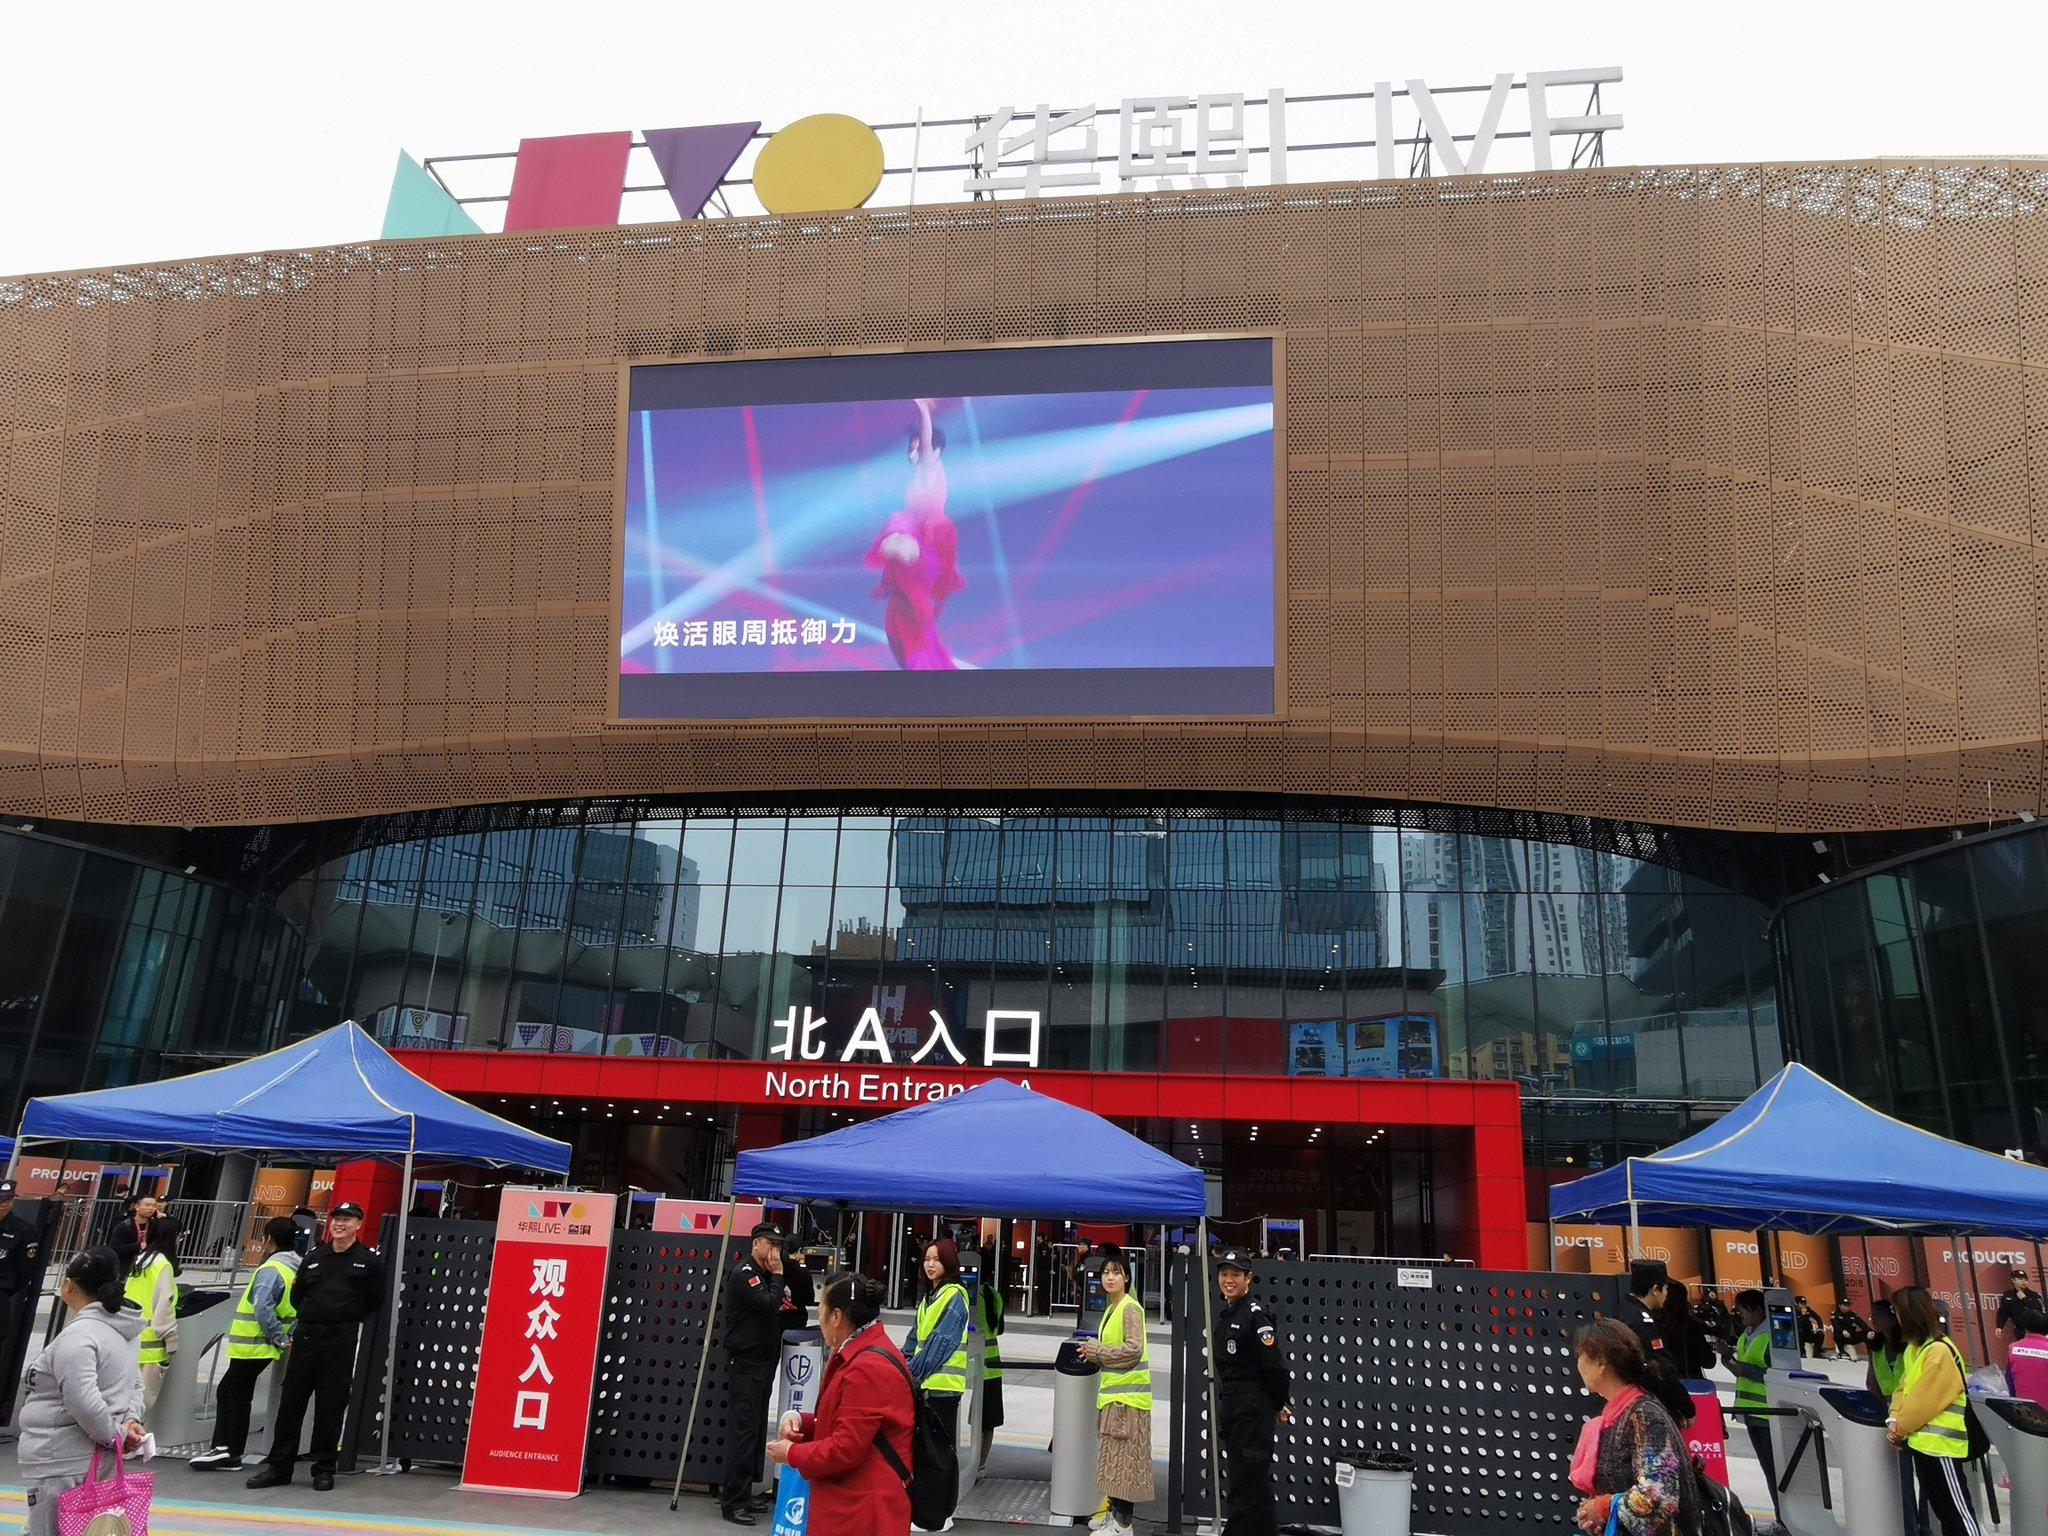 GP - 4 этап. Cup of China Chongqing / CHN November 8-10, 2019 - Страница 4 EI1MxAtVAAAImgM?format=jpg&name=4096x4096